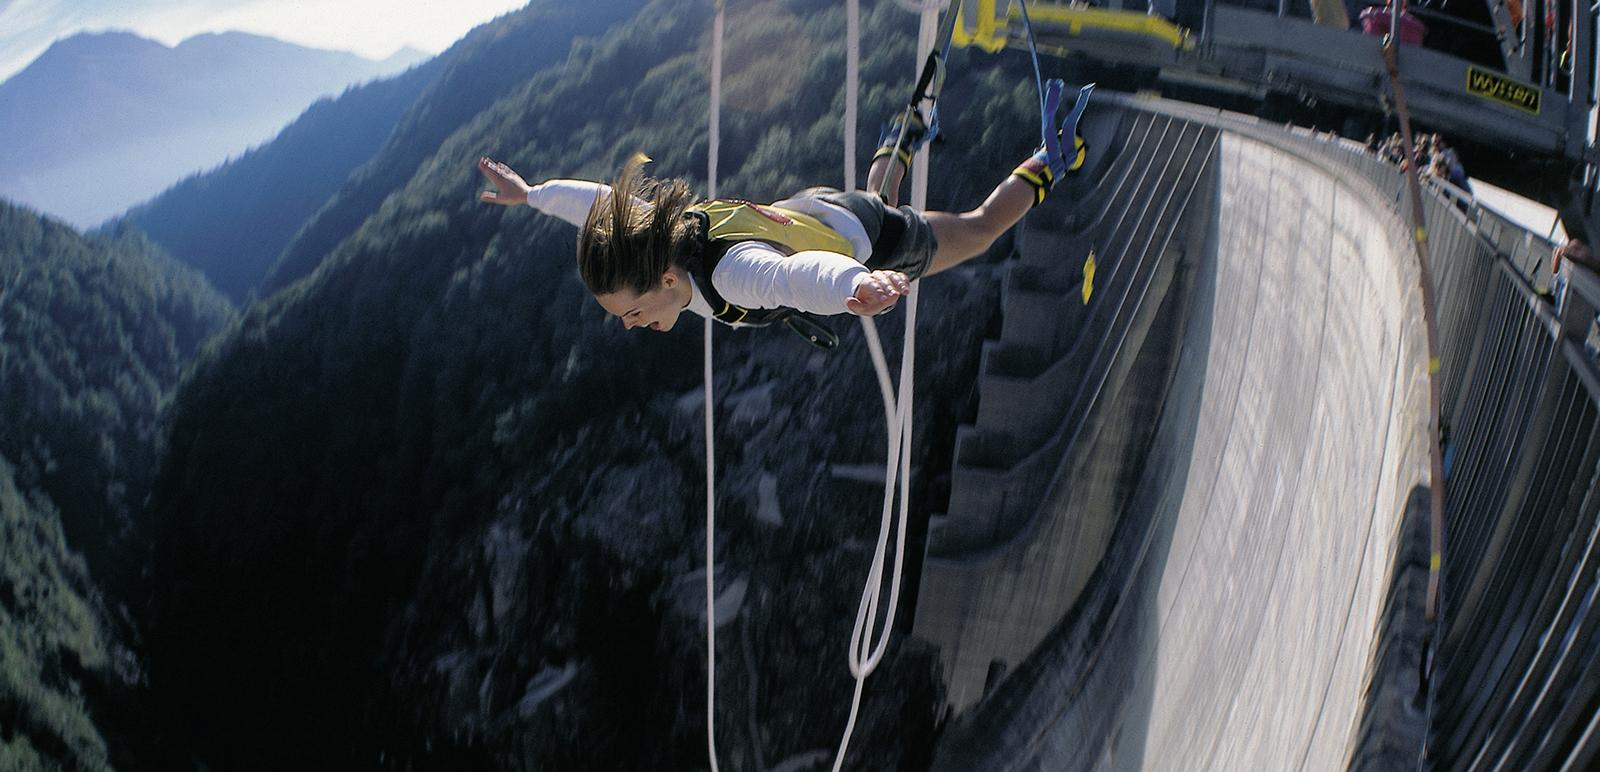 Bungee Jumping im Verzascatal